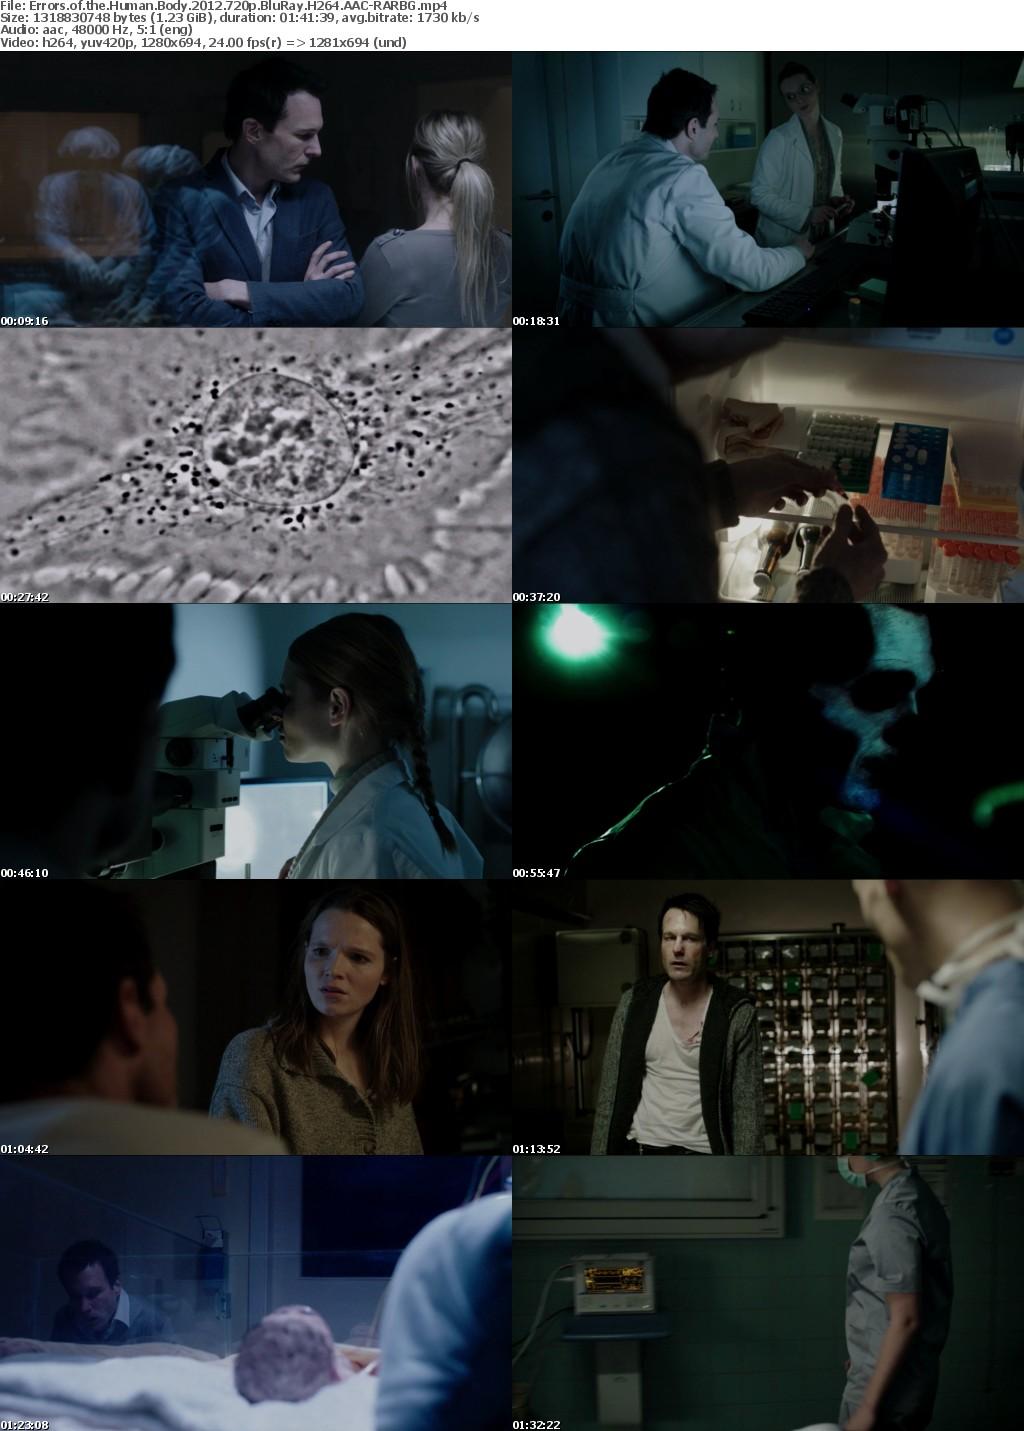 Errors of the Human Body (2012) 720p BluRay H264 AAC-RARBG